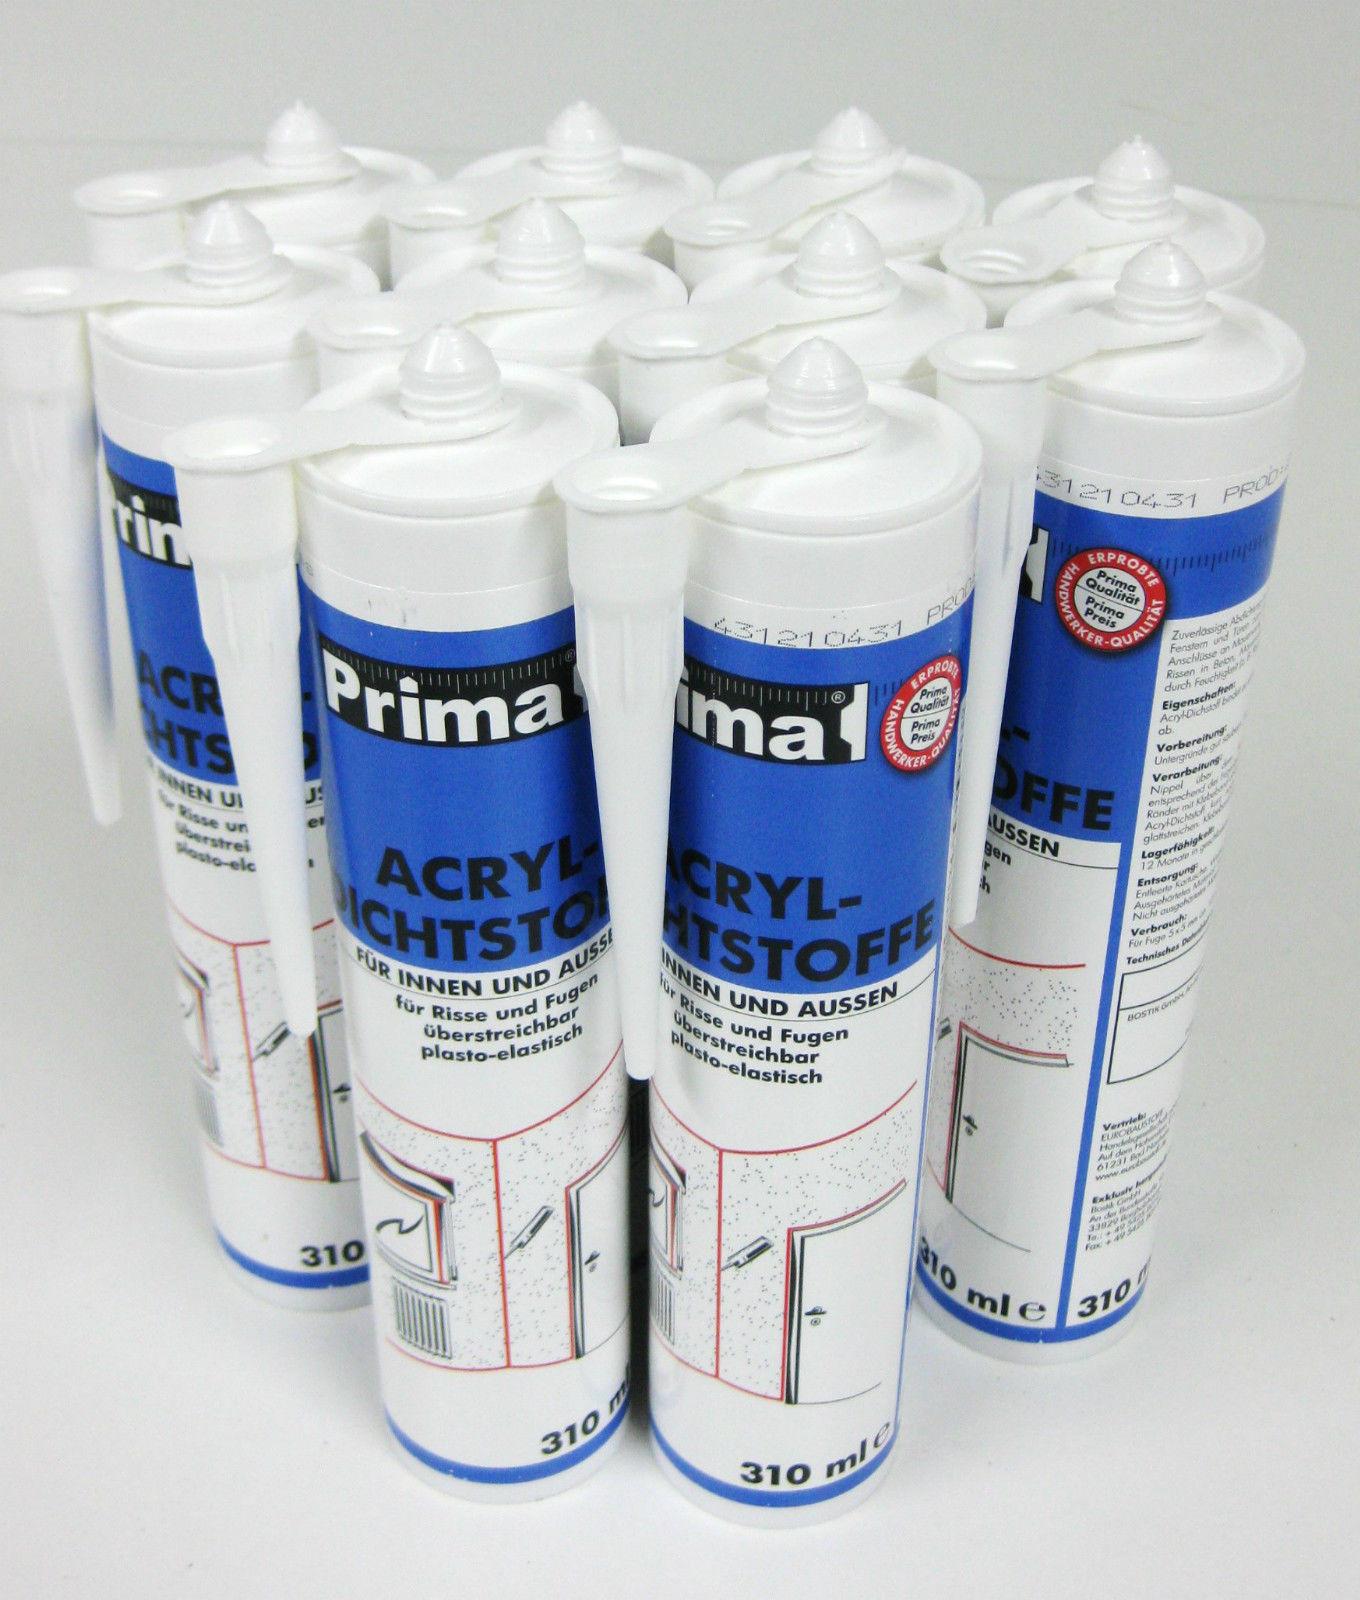 paket] 10x acryl bostik 300 ml weiß dichtstoff bauacryl dichtmasse